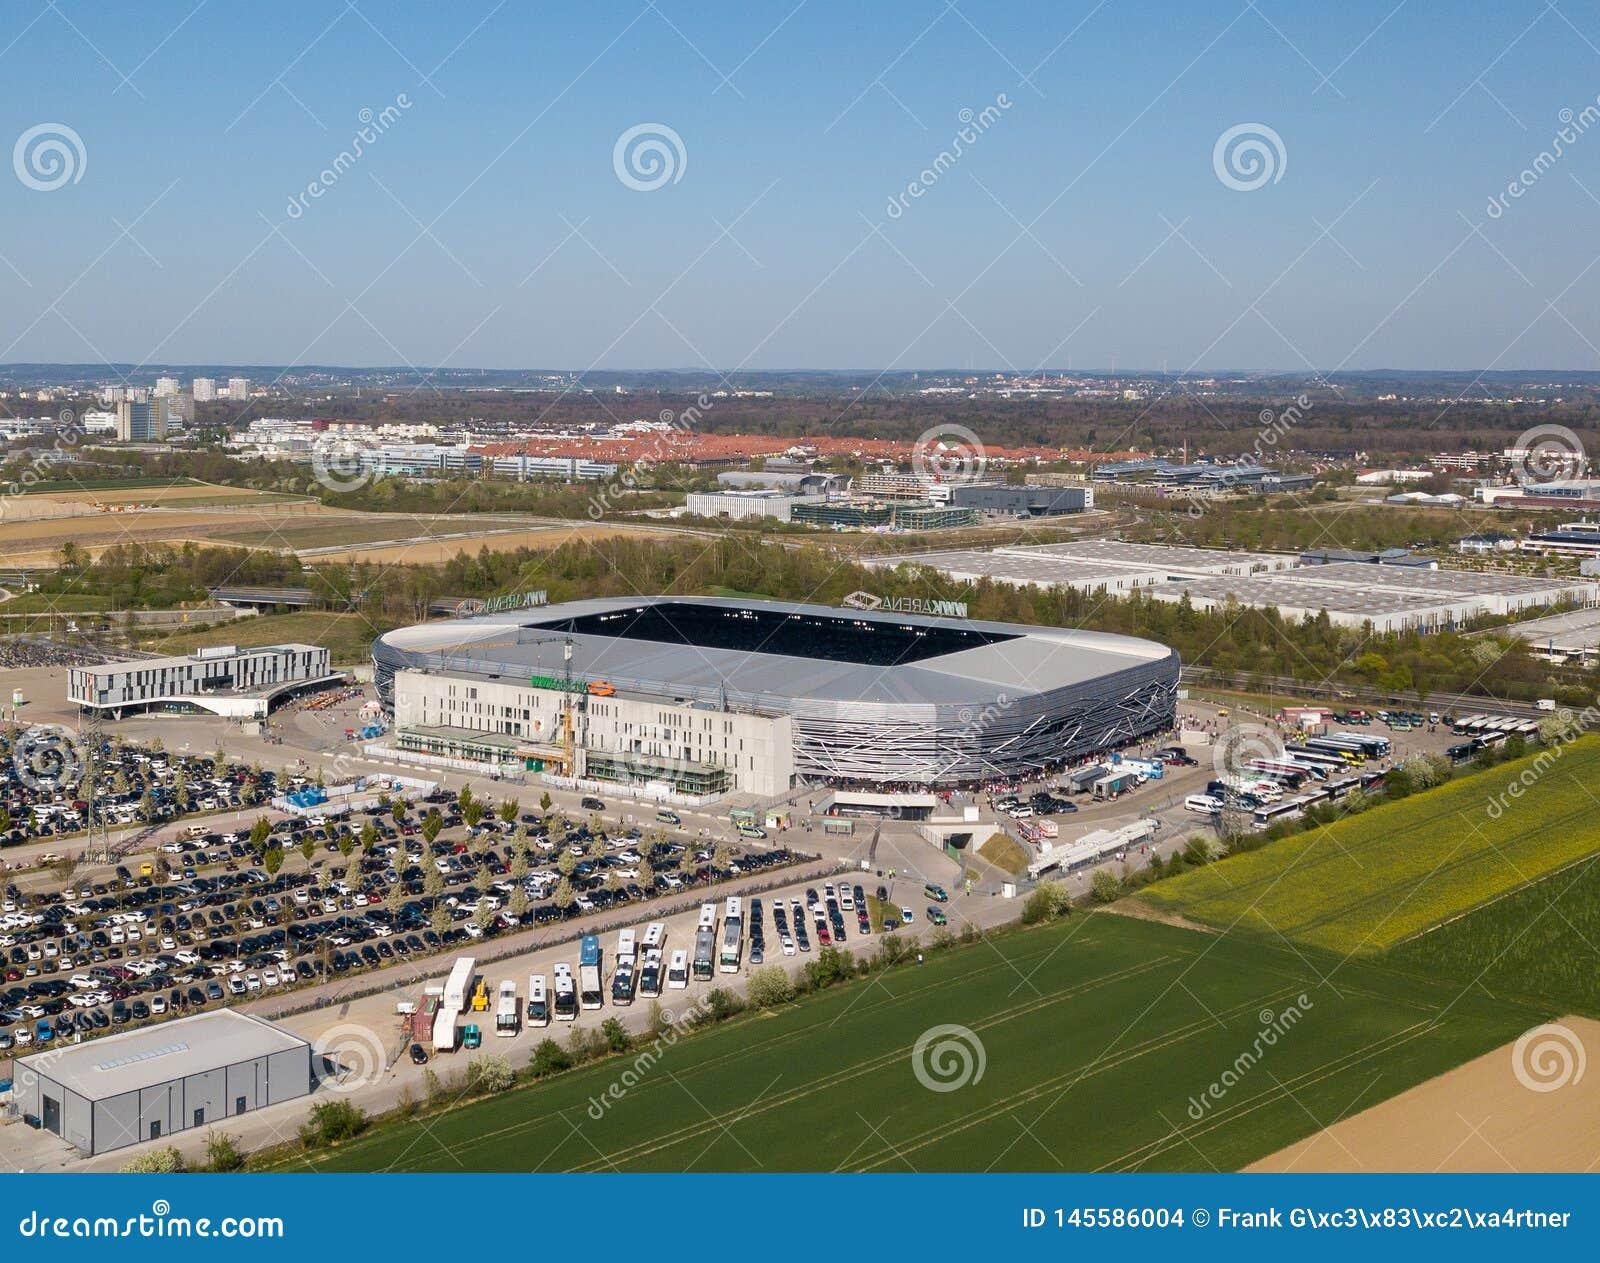 WWK竞技场-奥格斯堡足球俱乐部正式橄榄球场